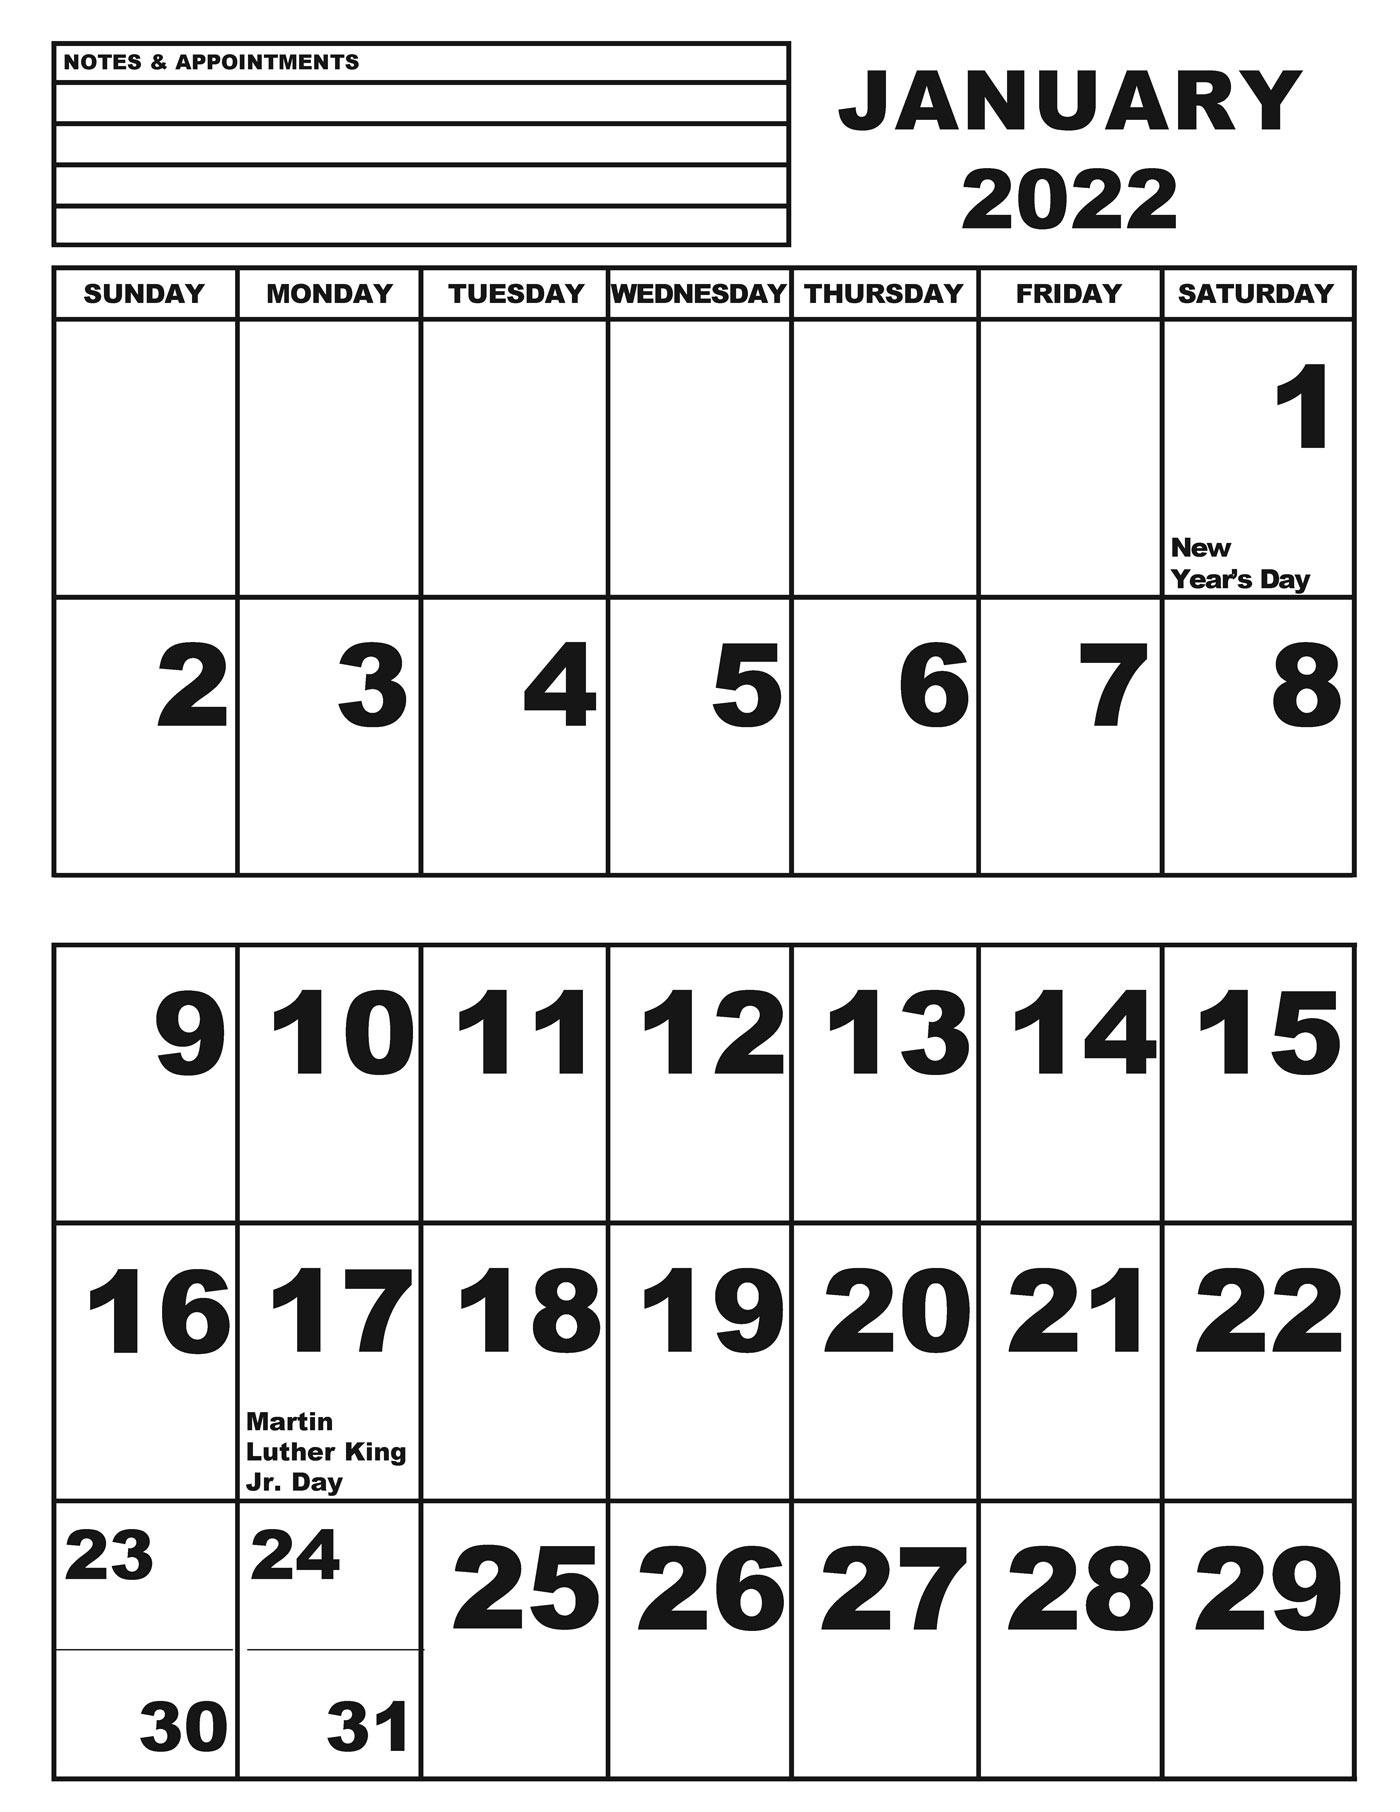 Jumbo Print Calendar- 2022